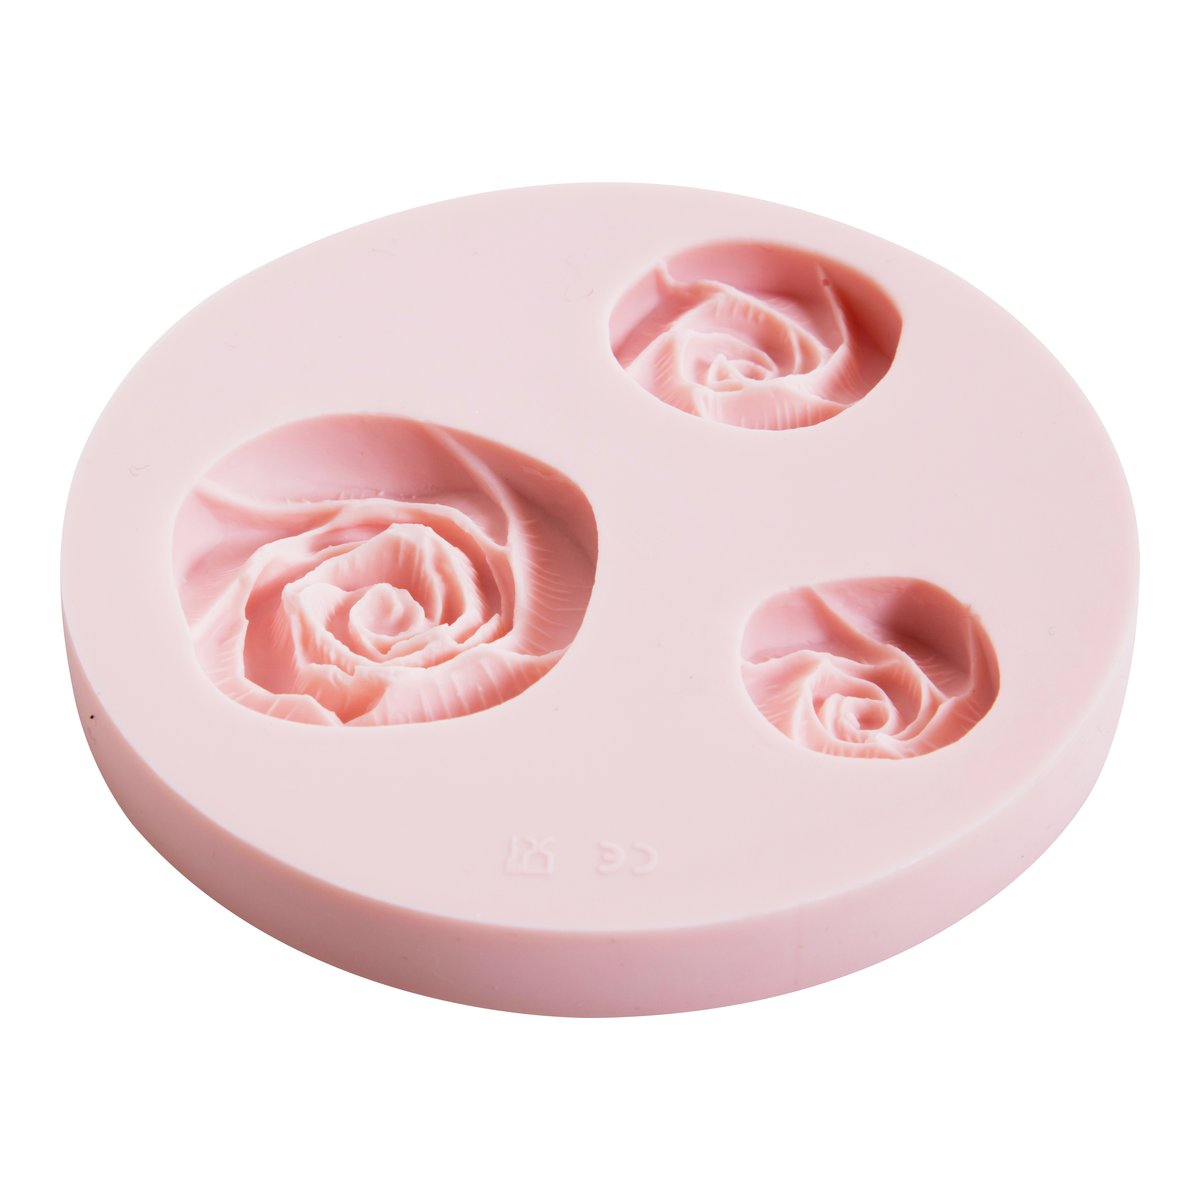 Rose silikonutstikker-BAK1049